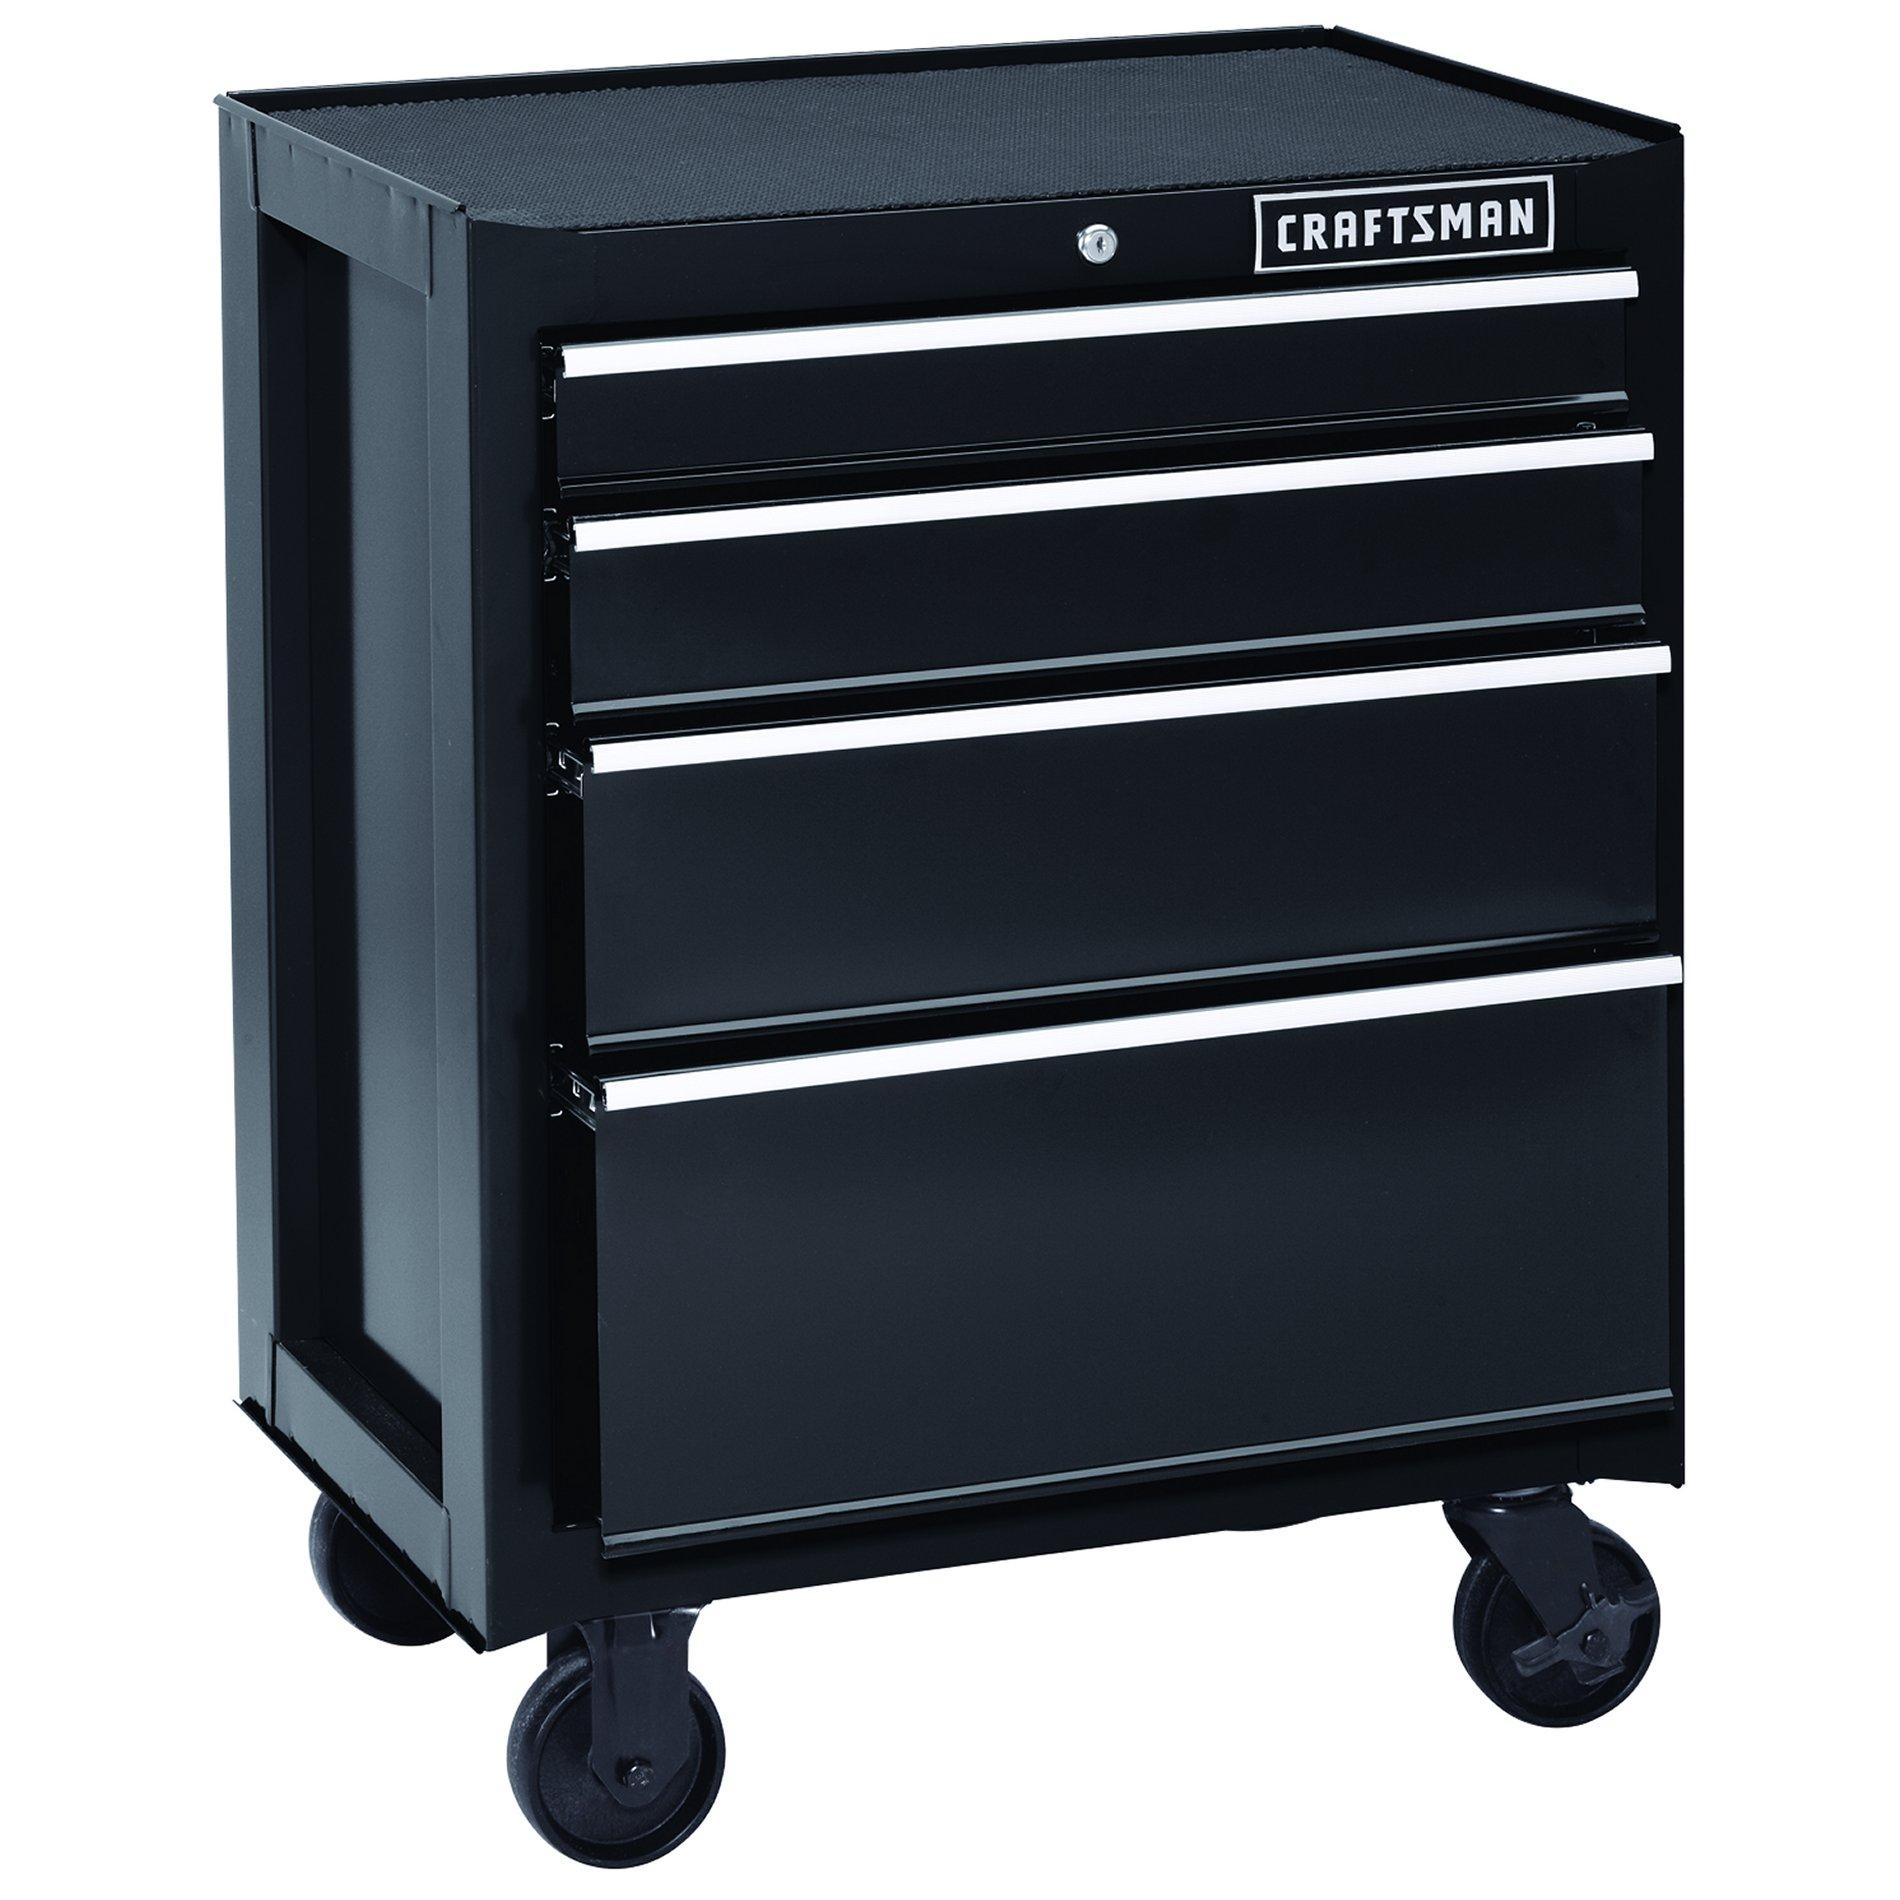 Craftsman 26 4Drawer HeavyDuty Rolling Cabinet  Black